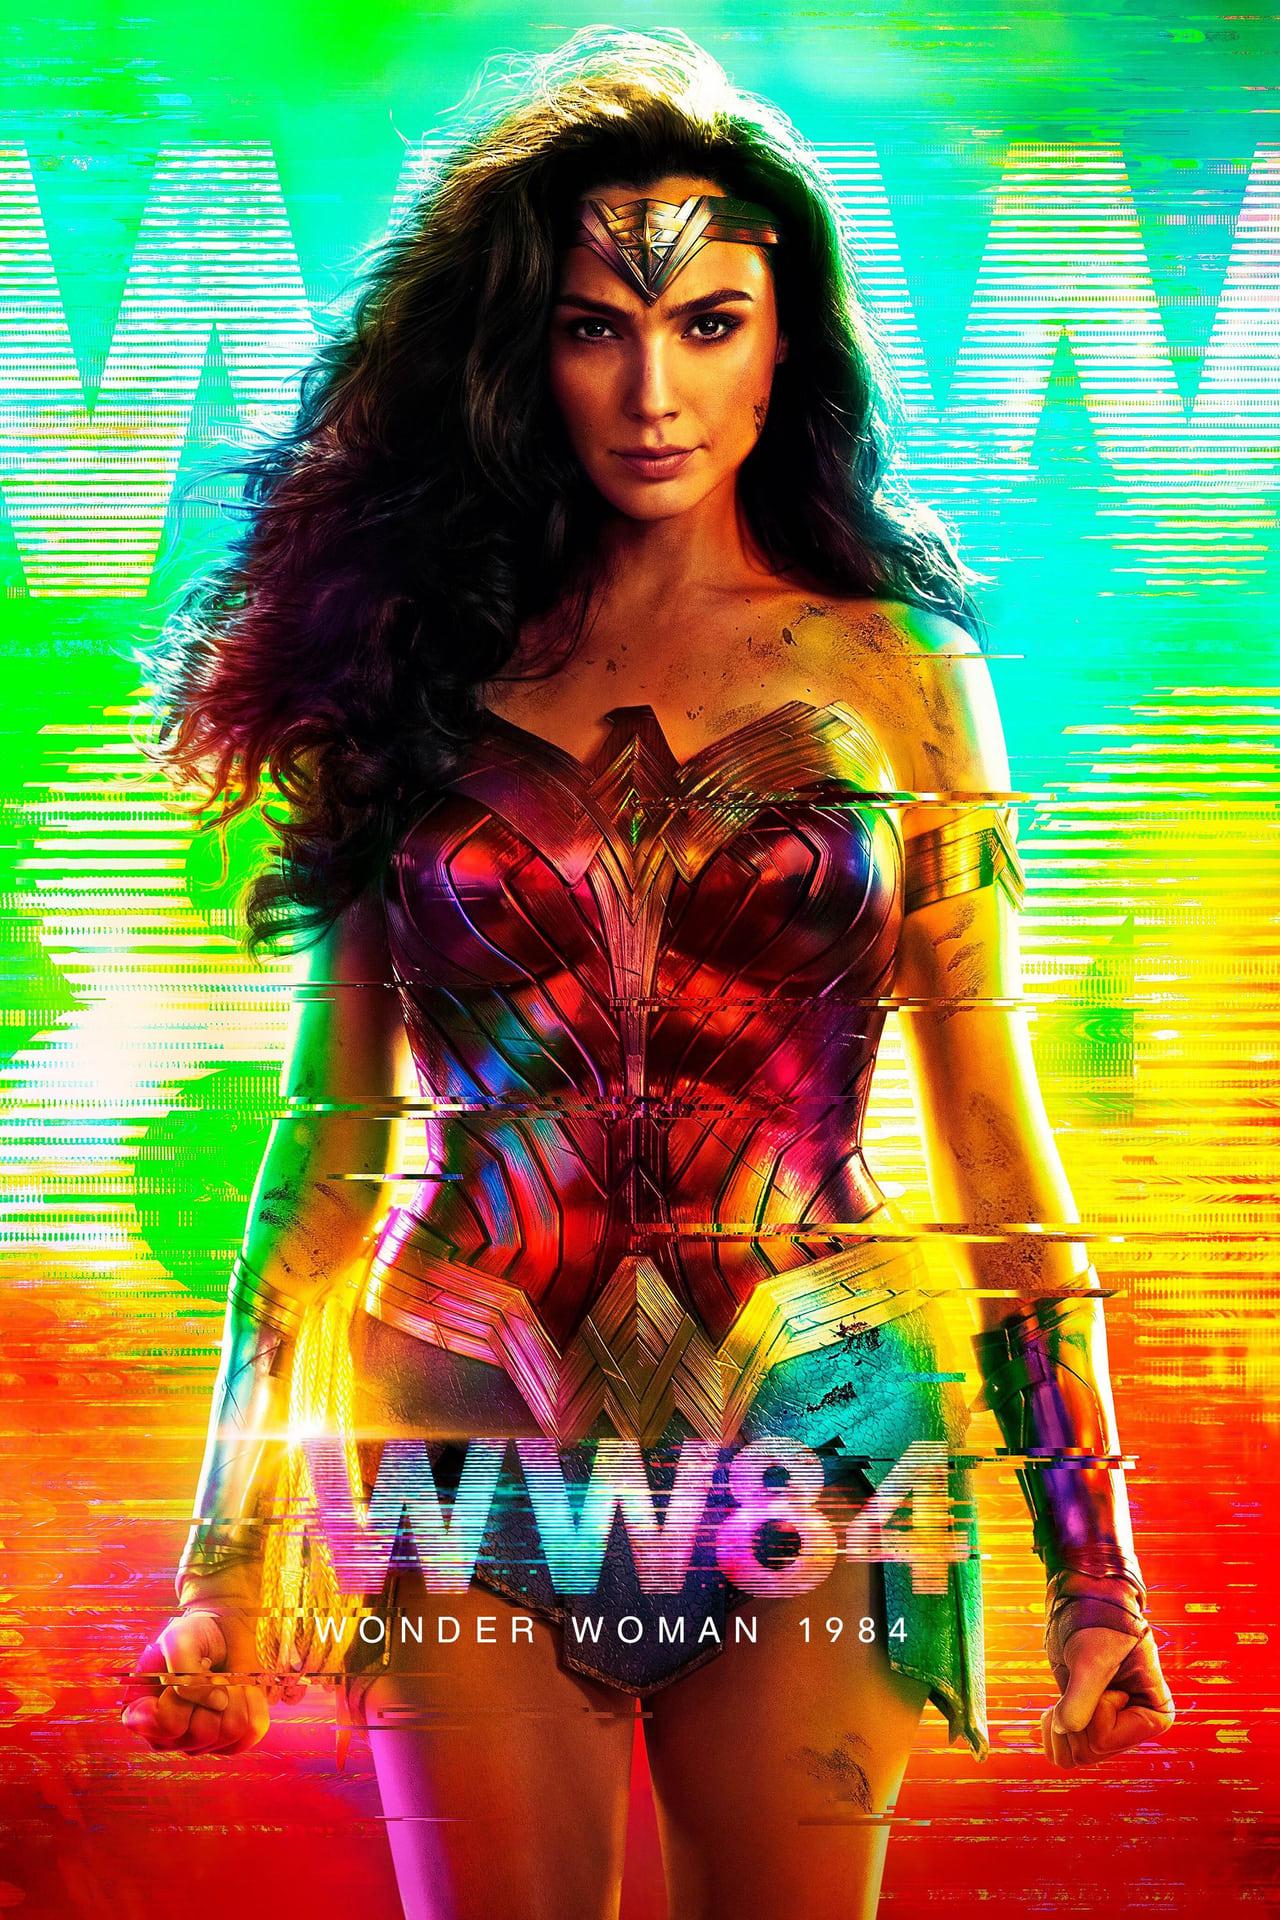 """Wonder Woman 1984"" poster"